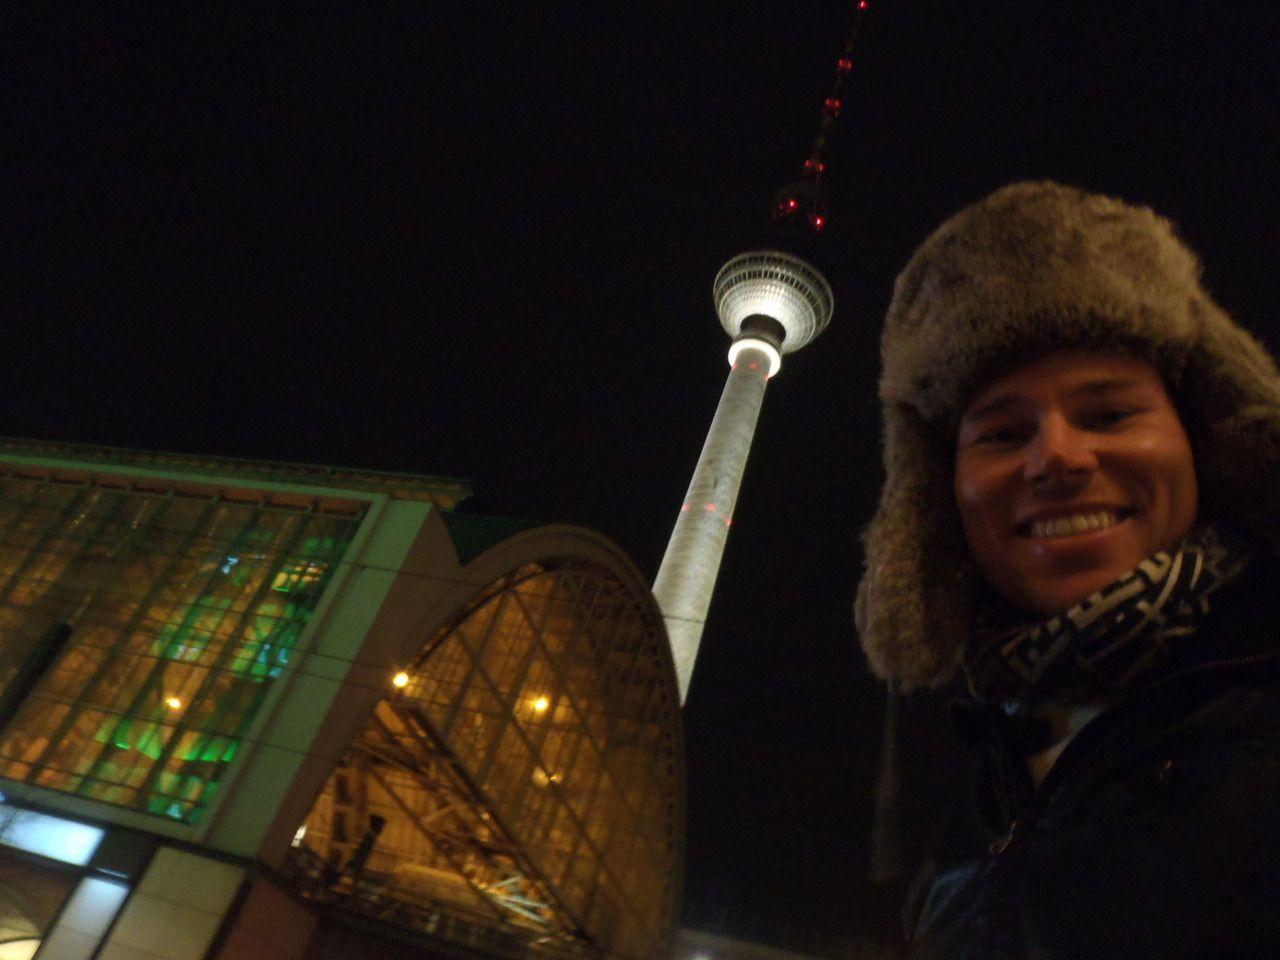 Myself At Alexanderplatz